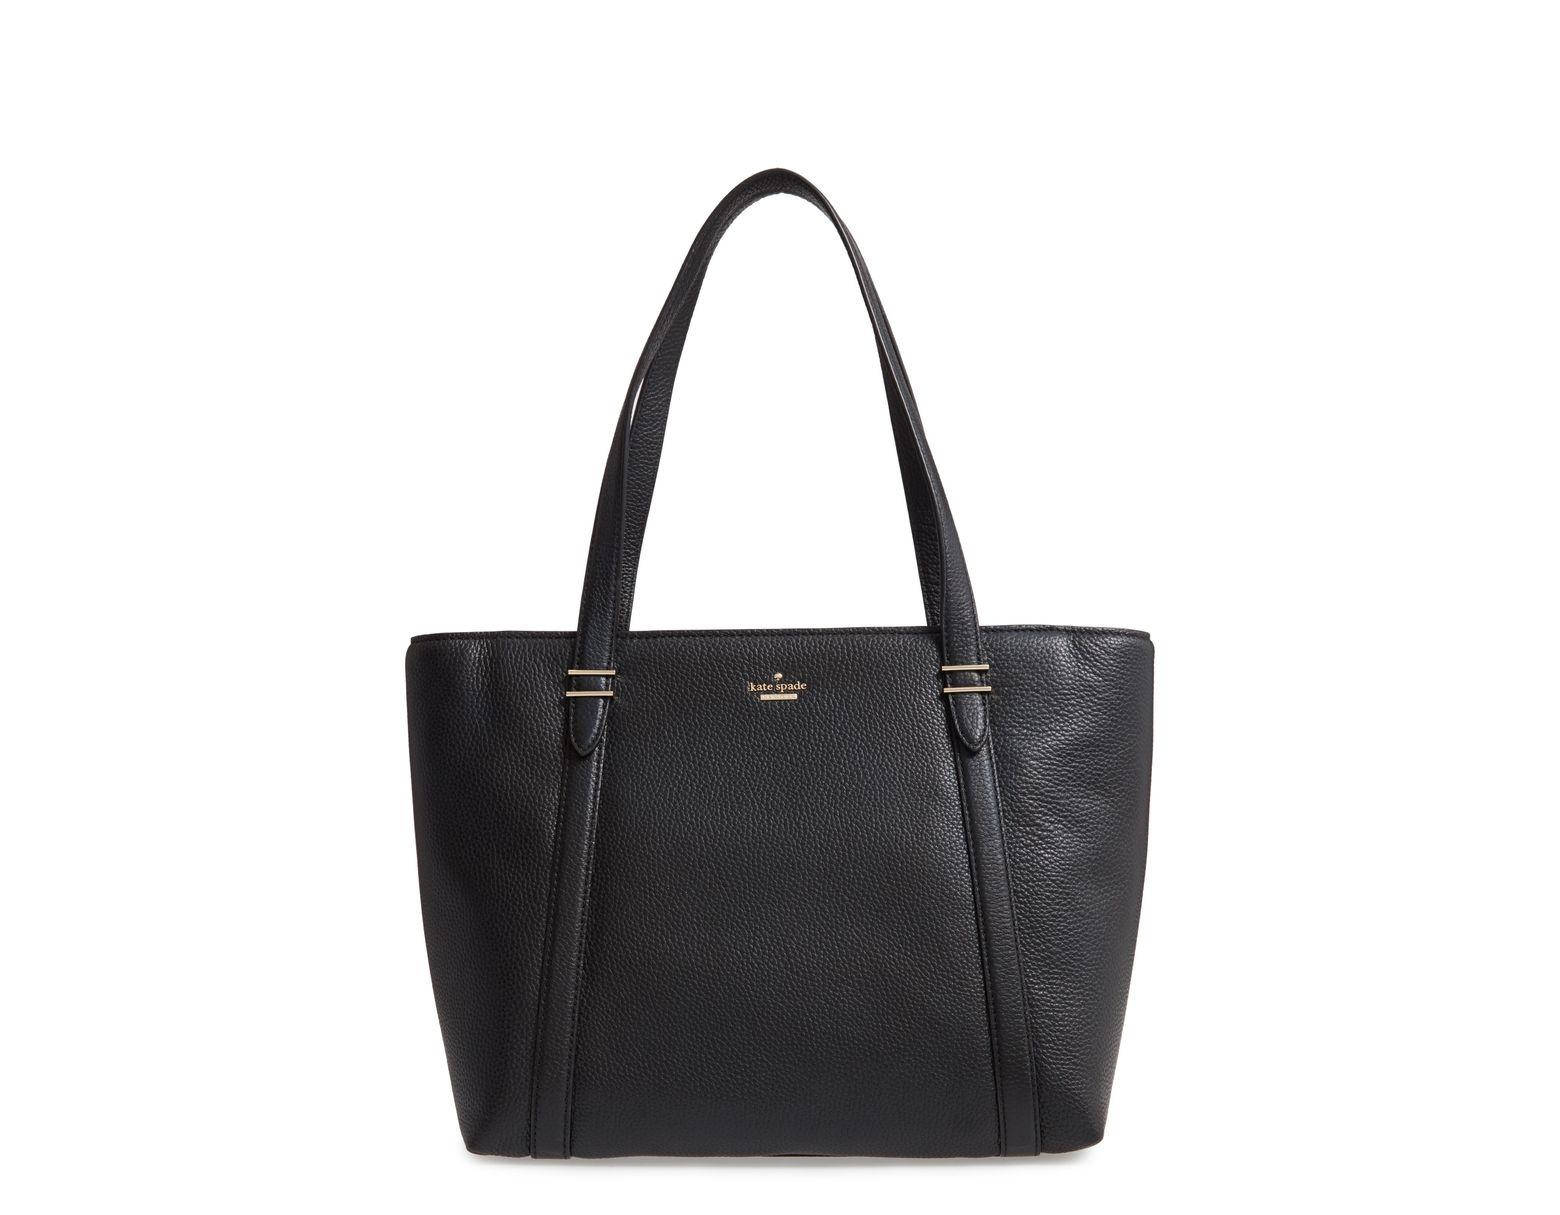 f91308dc1b4b Kate Spade Oakwood Street Chandra Leather Tote in Black - Save 64% - Lyst